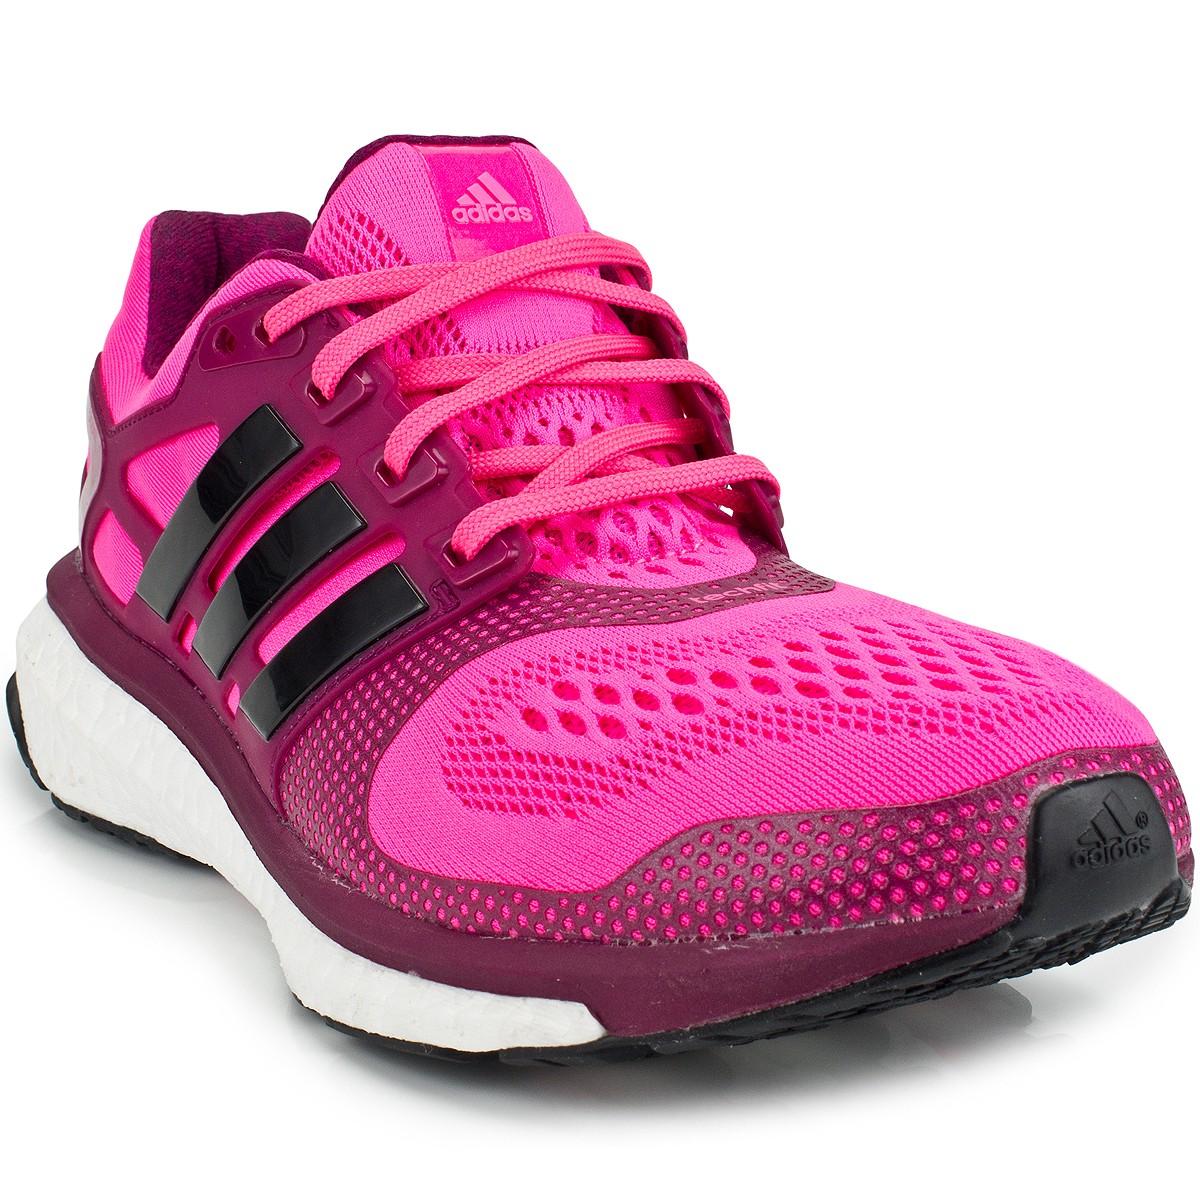 adidas boost energy rosa